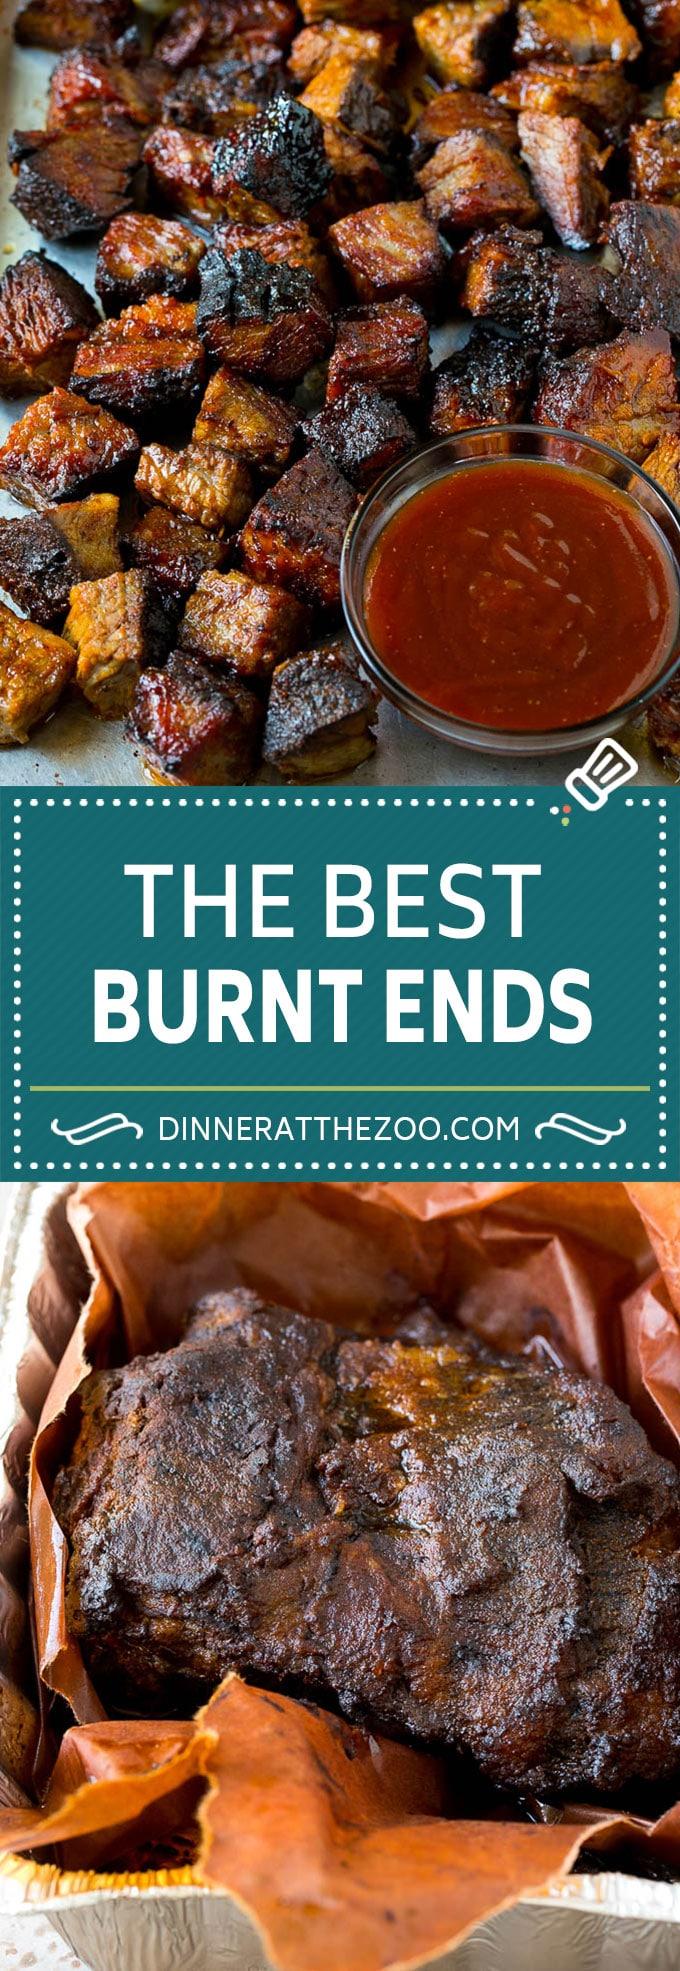 Burnt Ends Recipe | Smoked Brisket | Beef Brisket #brisket #bbq #smoker #beef #dinner #dinneratthezoo